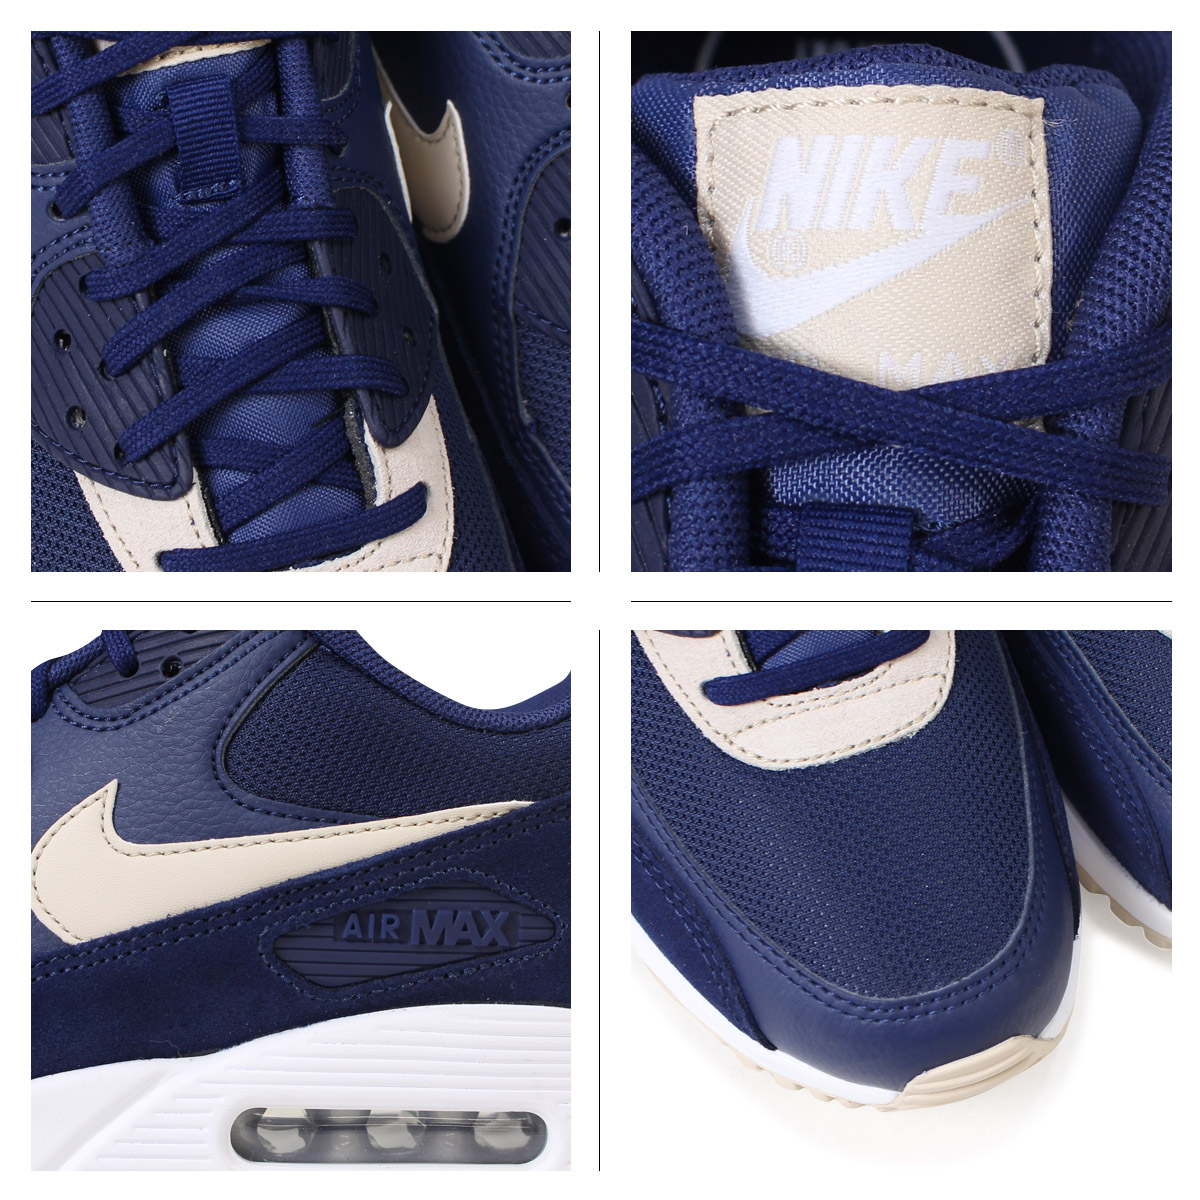 best service 95e59 6df1e Nike NIKE Air Max 90 lady s men s sneakers WMNS AIR MAX 90 325,213-410 blue   2 27 Shinnyu load